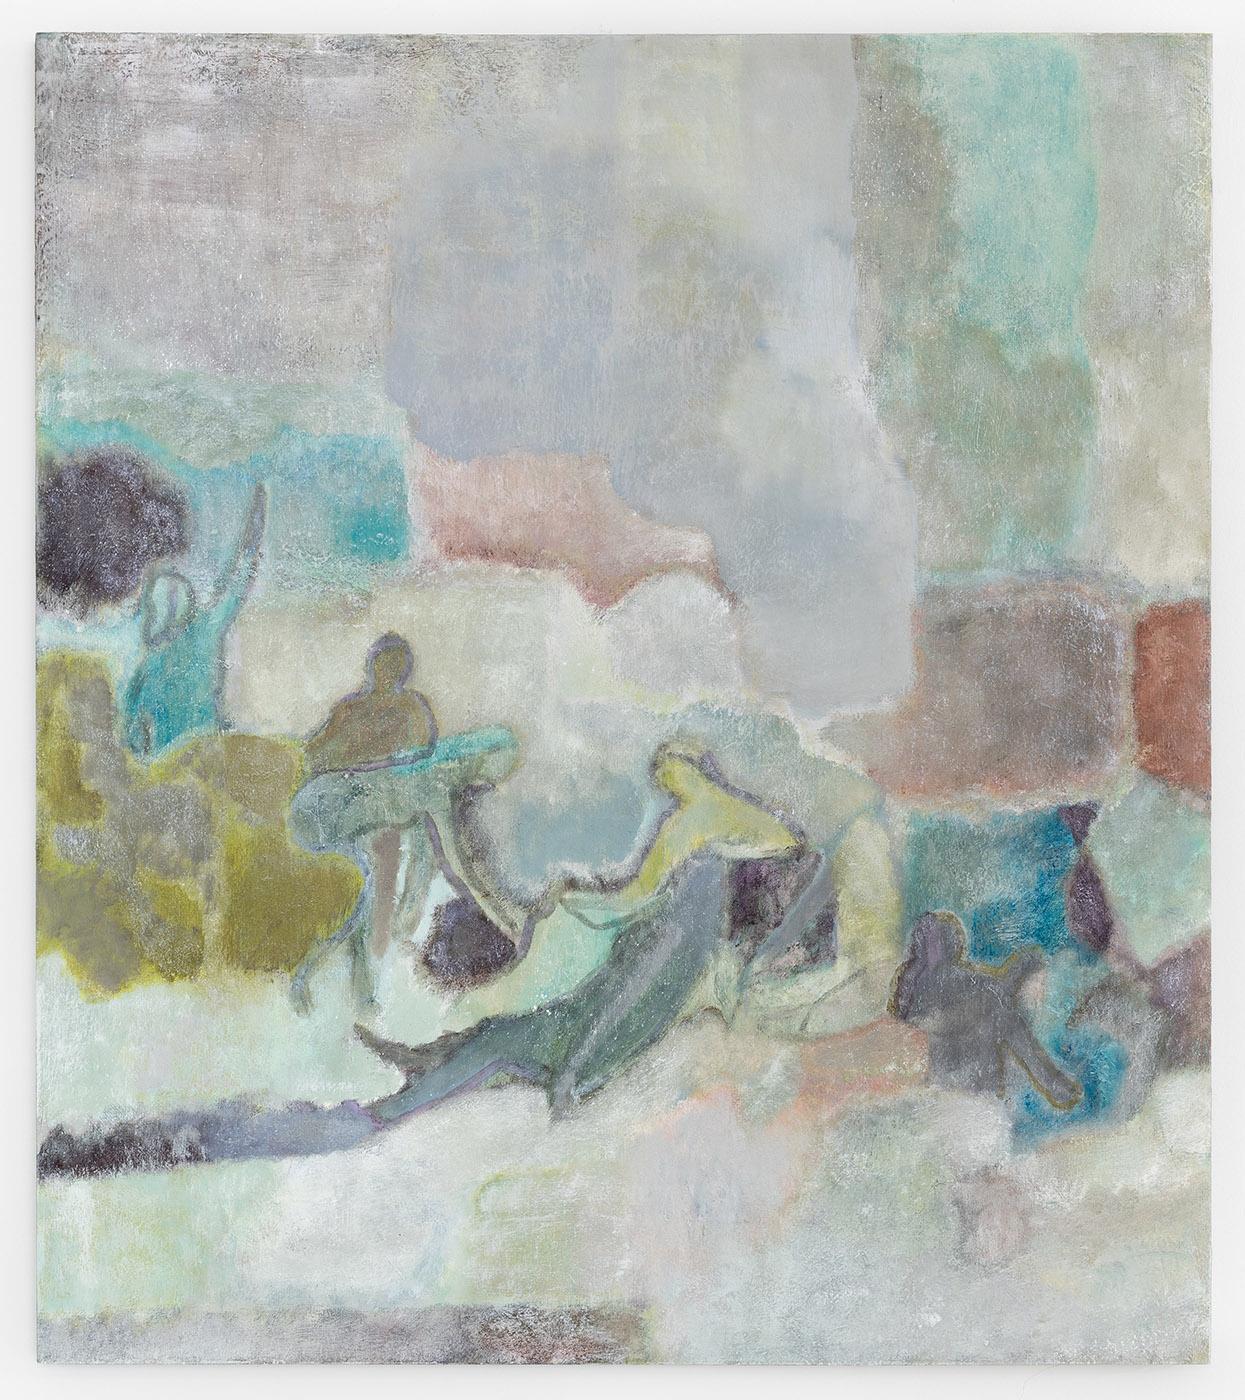 GalerieNicolasRobertNovembre2018 (4 of 27).jpg